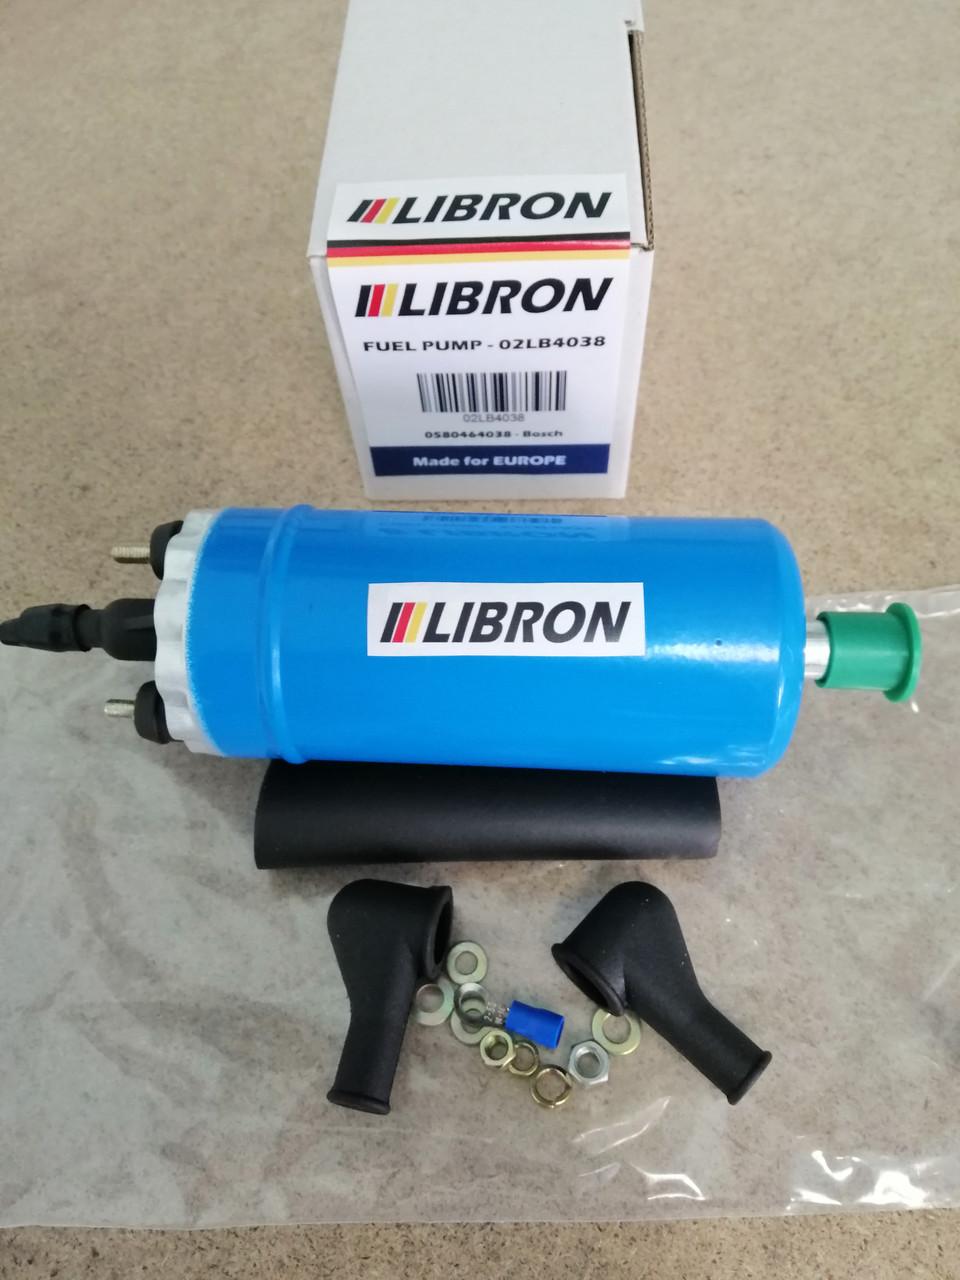 Топливный насос LIBRON 02LB4038 - OPEL REKORD E универсал (61_, 66_, 67_) 2.2 E (1984-1986)